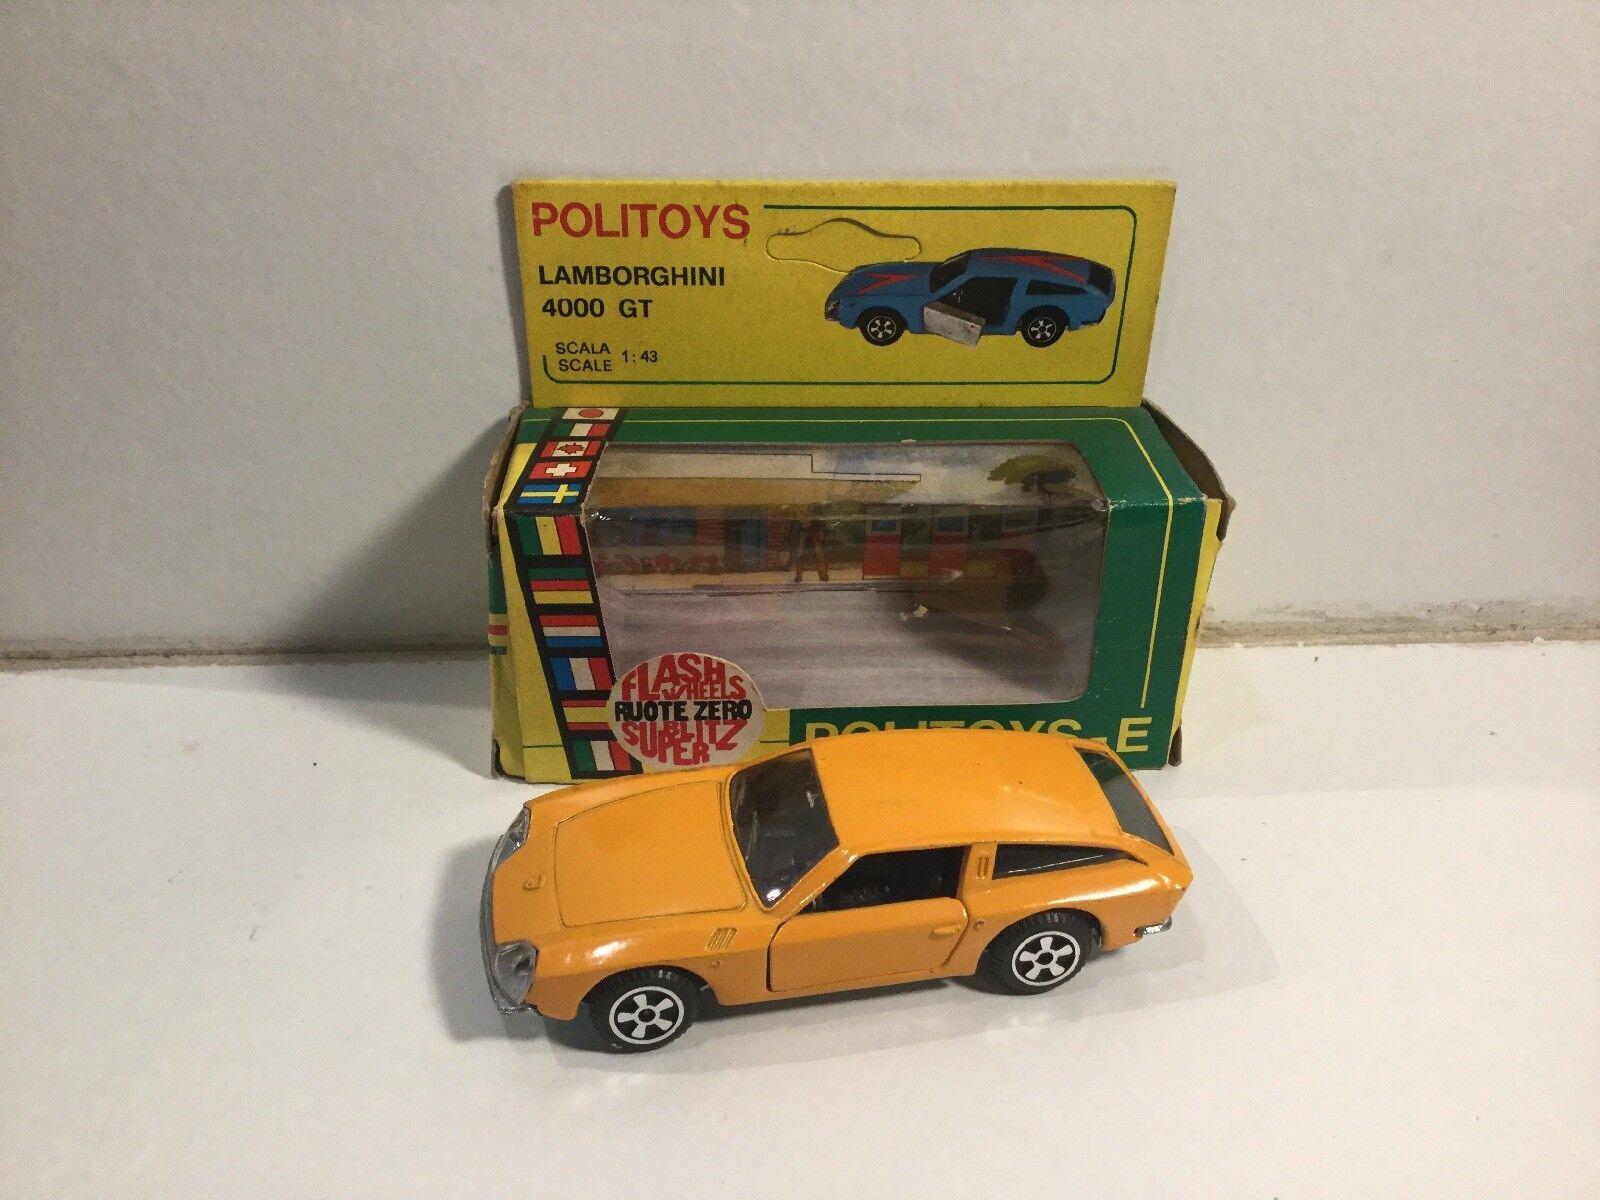 Vintage Politoys Lamborghini 4000 GT No 557 Within Its Original Box